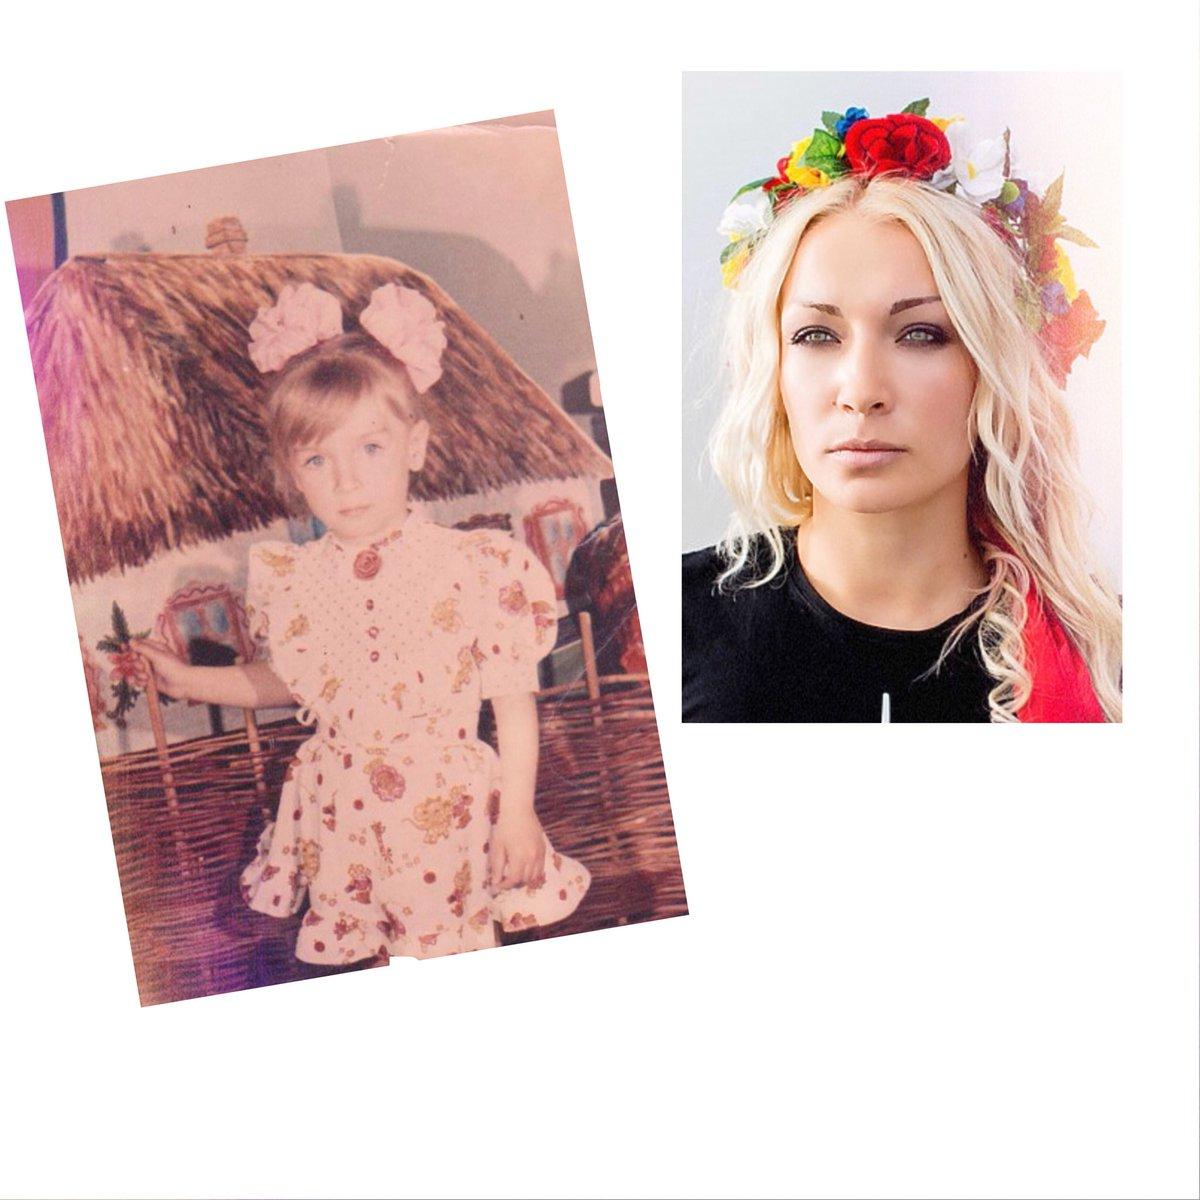 FEMEN_Movement photo